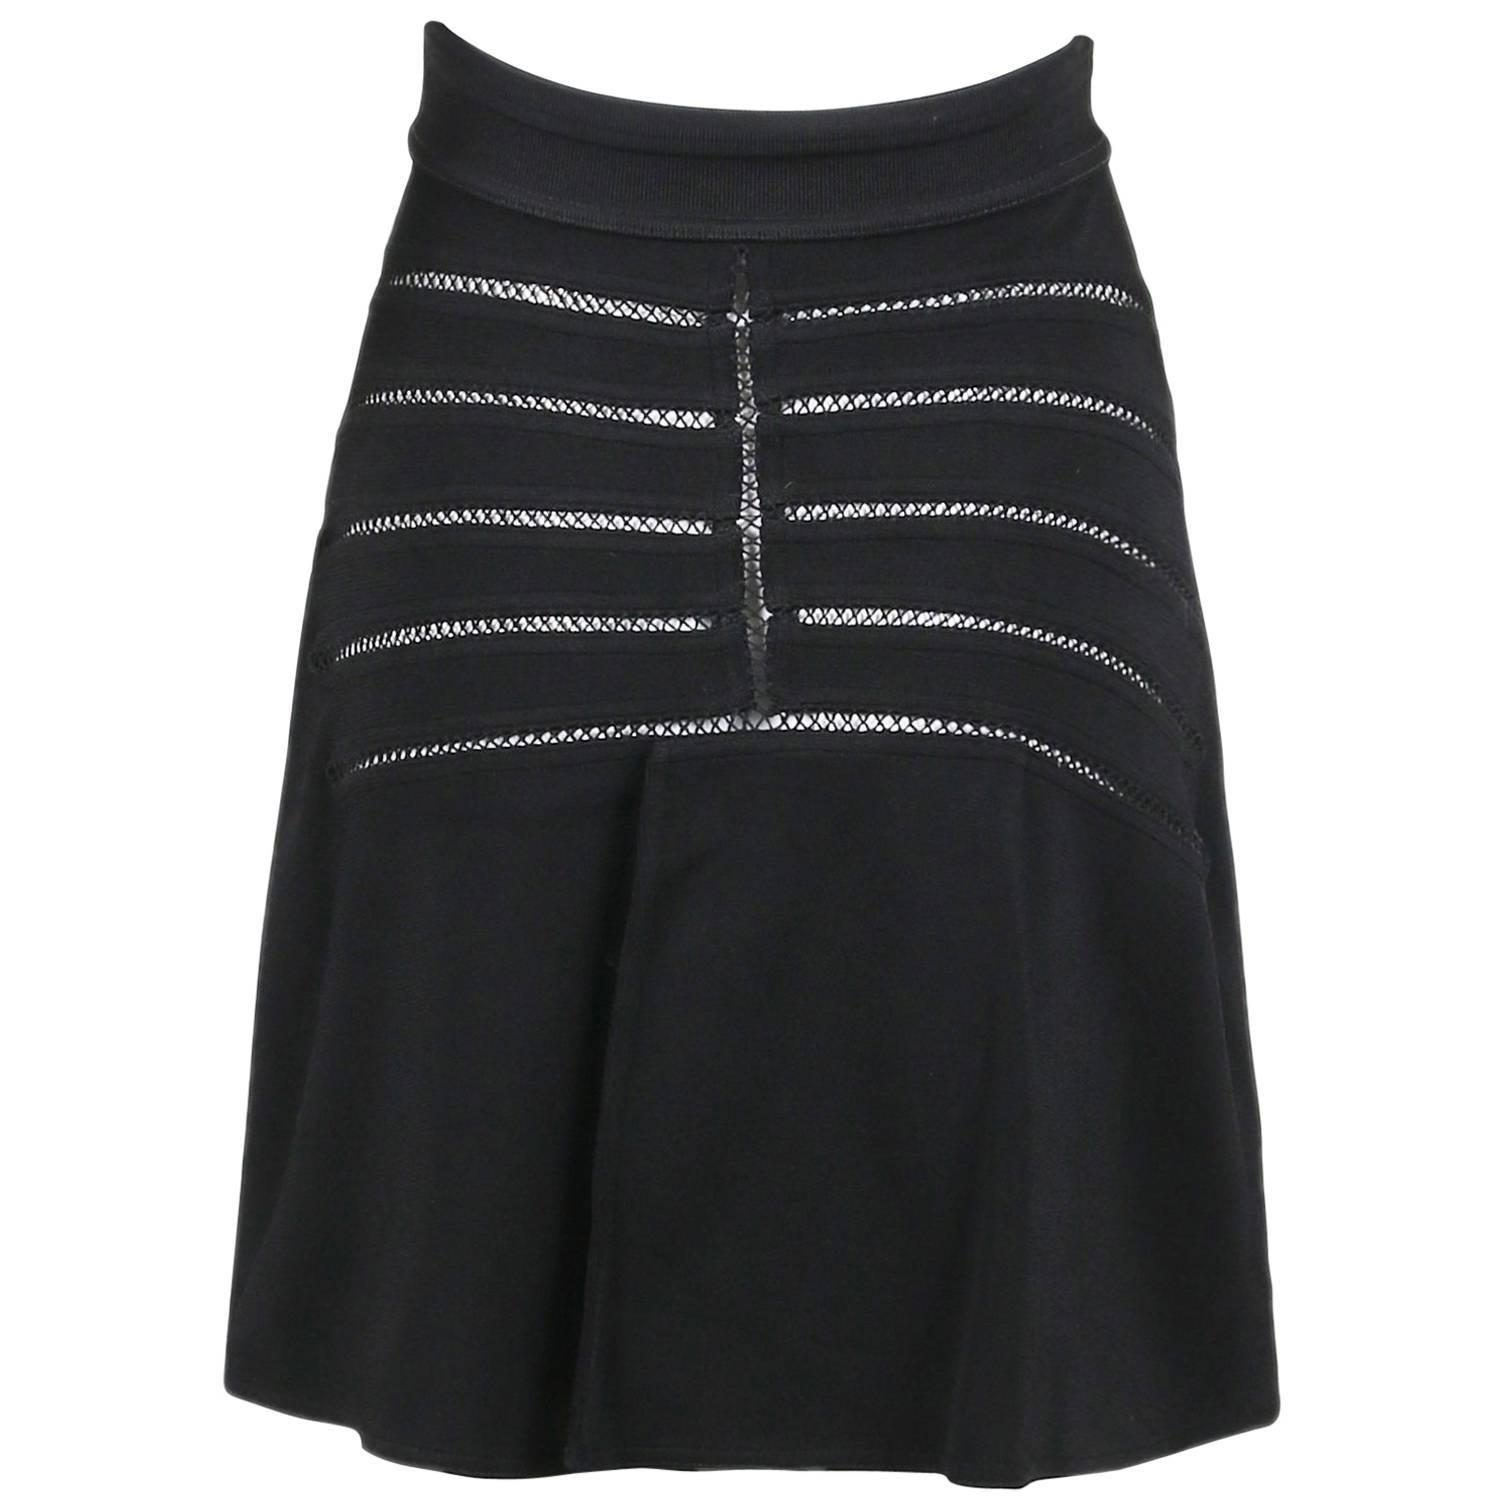 Alaia Black Stretch A-Line Mini Skirt W/Crochet Detail